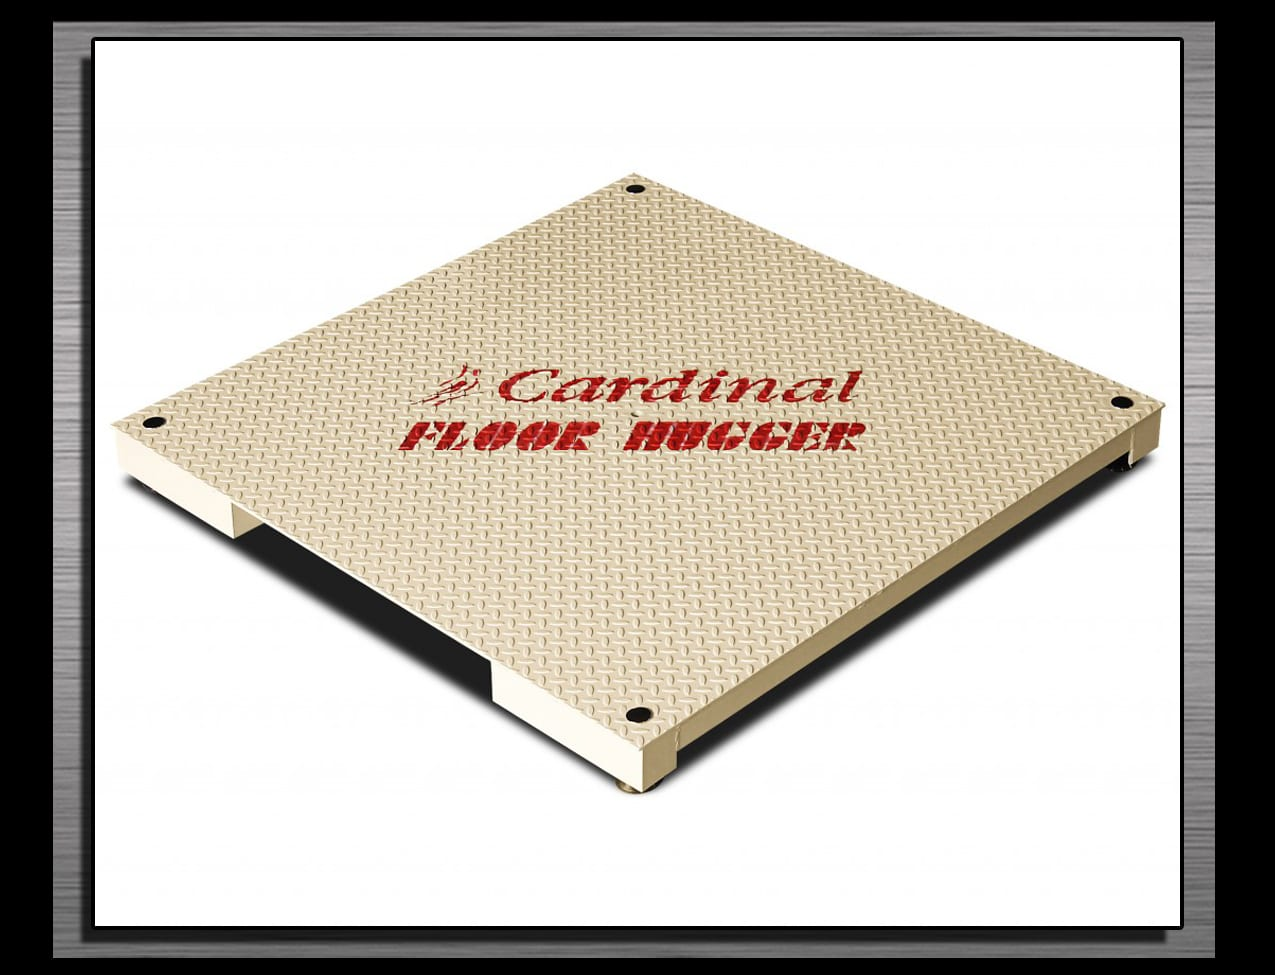 cardinal-floor-hugger